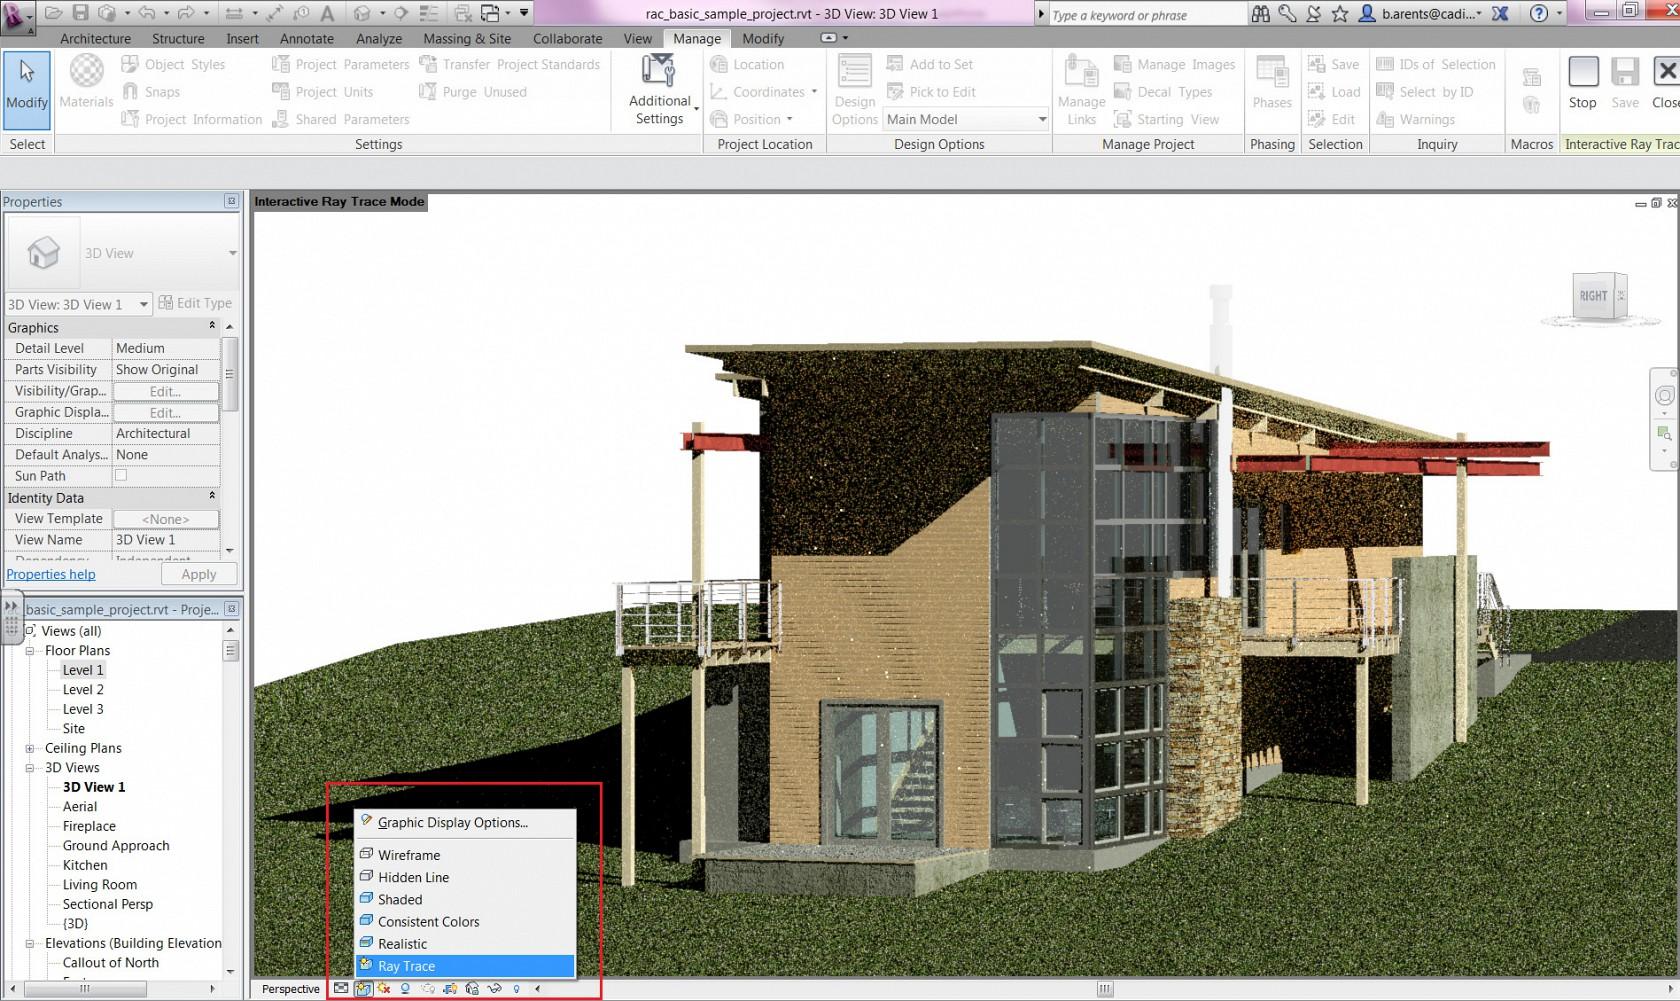 Lovely ... Autodesk Revit Architecture 2013 Screenshot